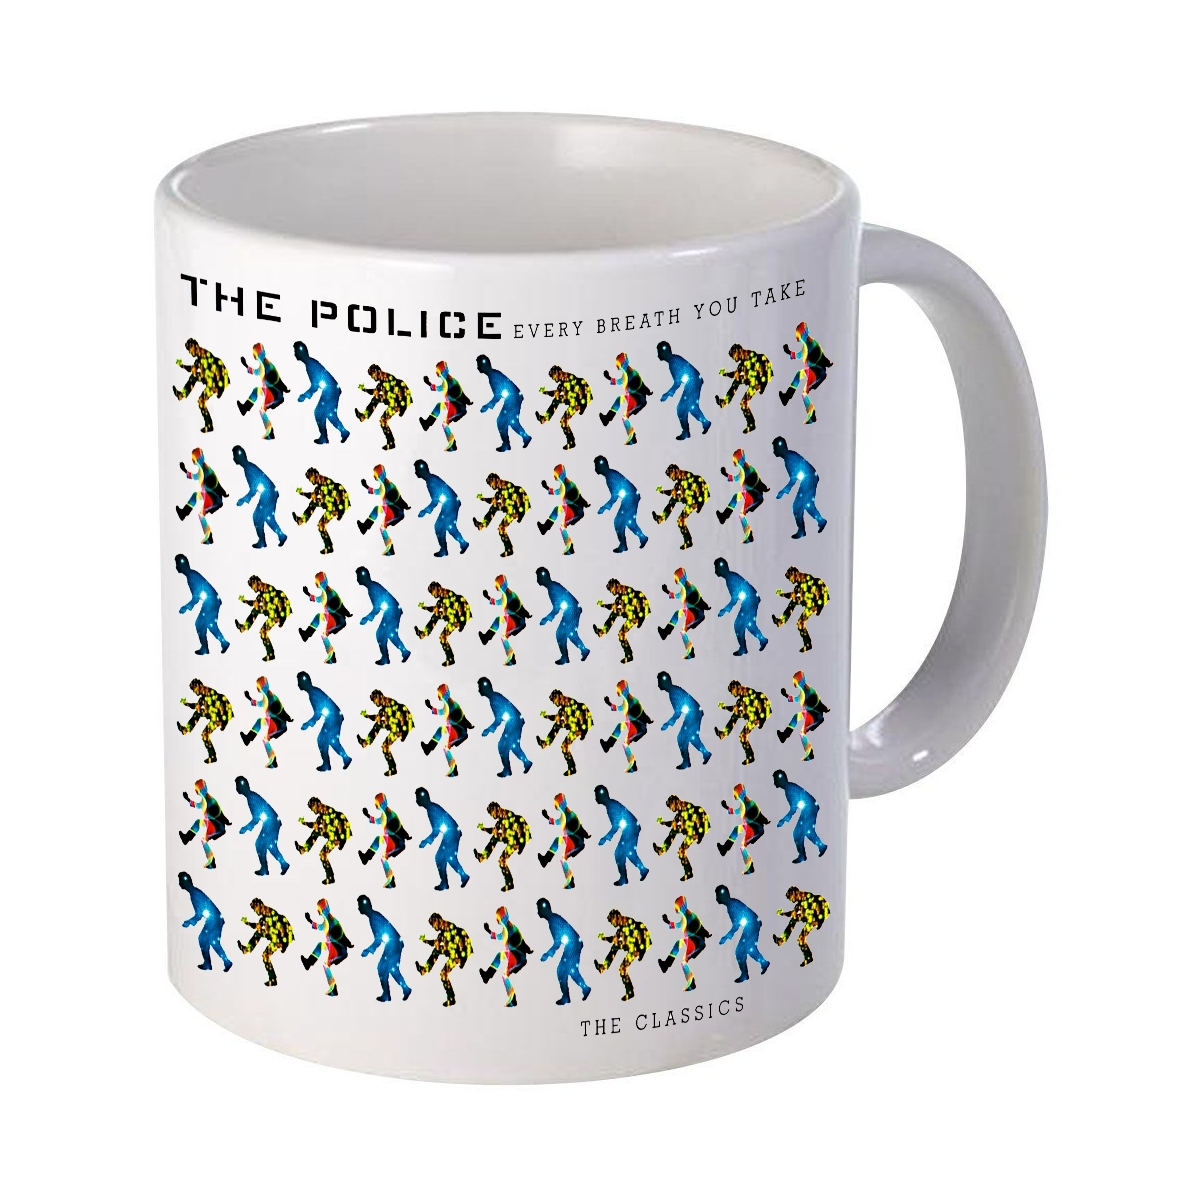 The Classics Mug